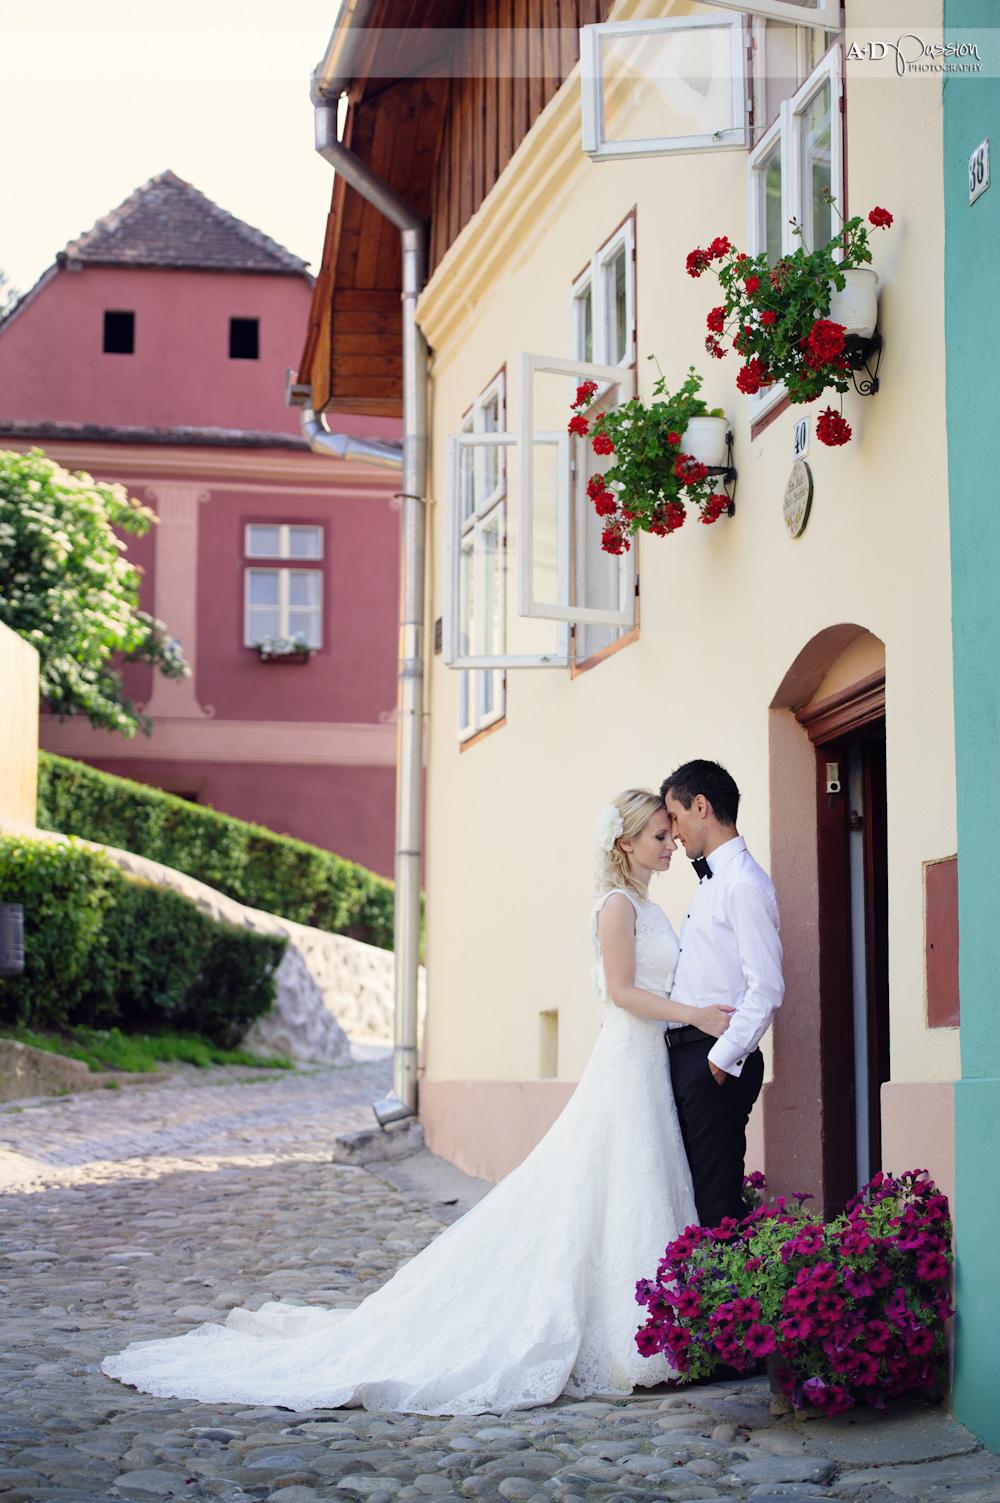 AD Passion Photography | 20120521_fotograf-profesionist-nunta-bucuresti_sedinta-foto-dupa-nunta-trash-the-dress_gabriela-si-lari__0013 | Adelin, Dida, fotograf profesionist, fotograf de nunta, fotografie de nunta, fotograf Timisoara, fotograf Craiova, fotograf Bucuresti, fotograf Arad, nunta Timisoara, nunta Arad, nunta Bucuresti, nunta Craiova